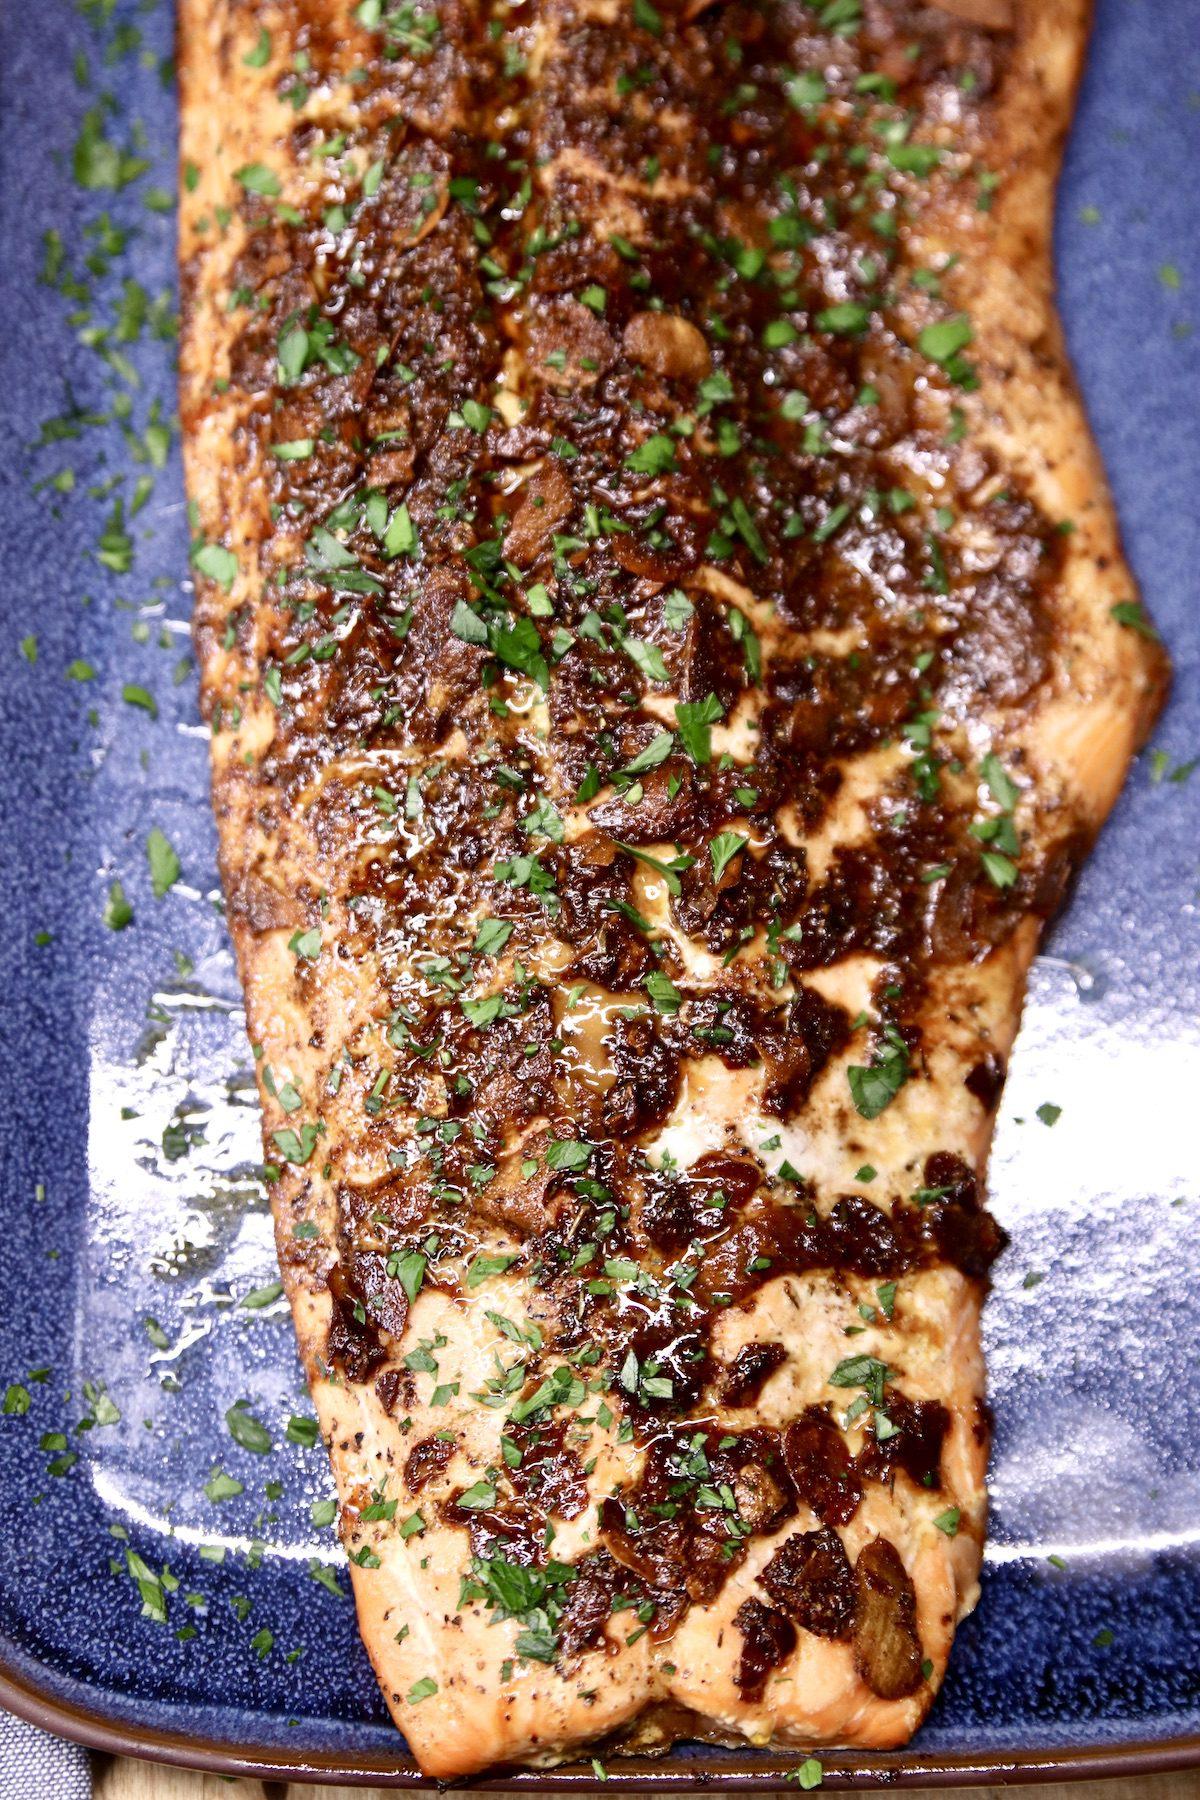 grilled garlic butter salmon fillet on a blue platter